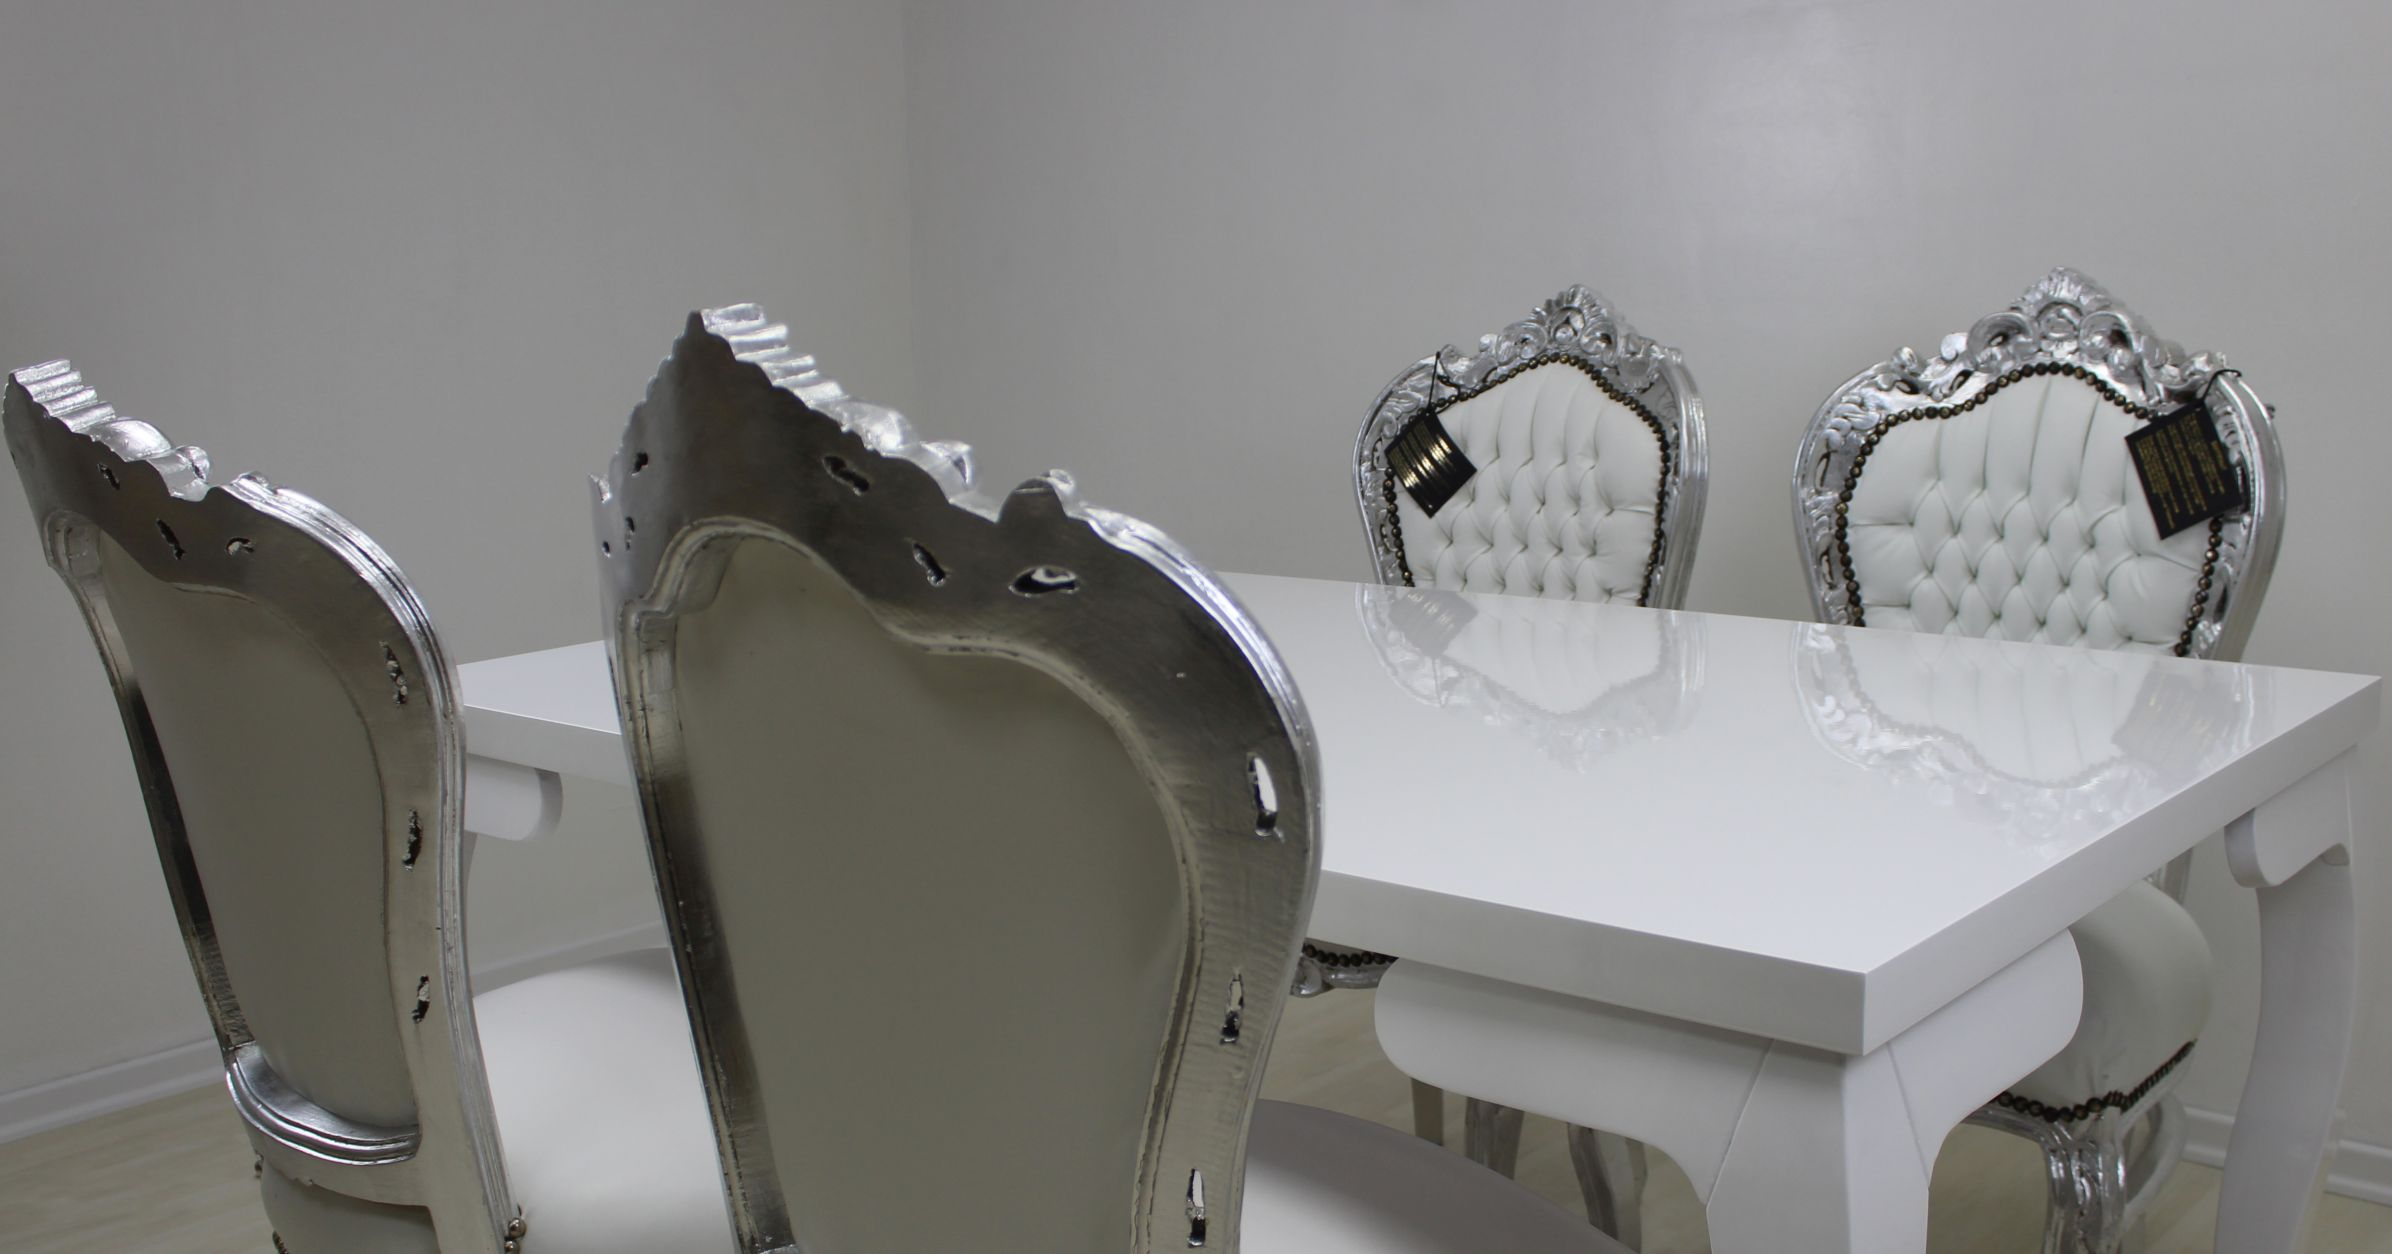 Barock Moebel Esstisch Casa Padrino Luxus Esszimmertisch Esstisch